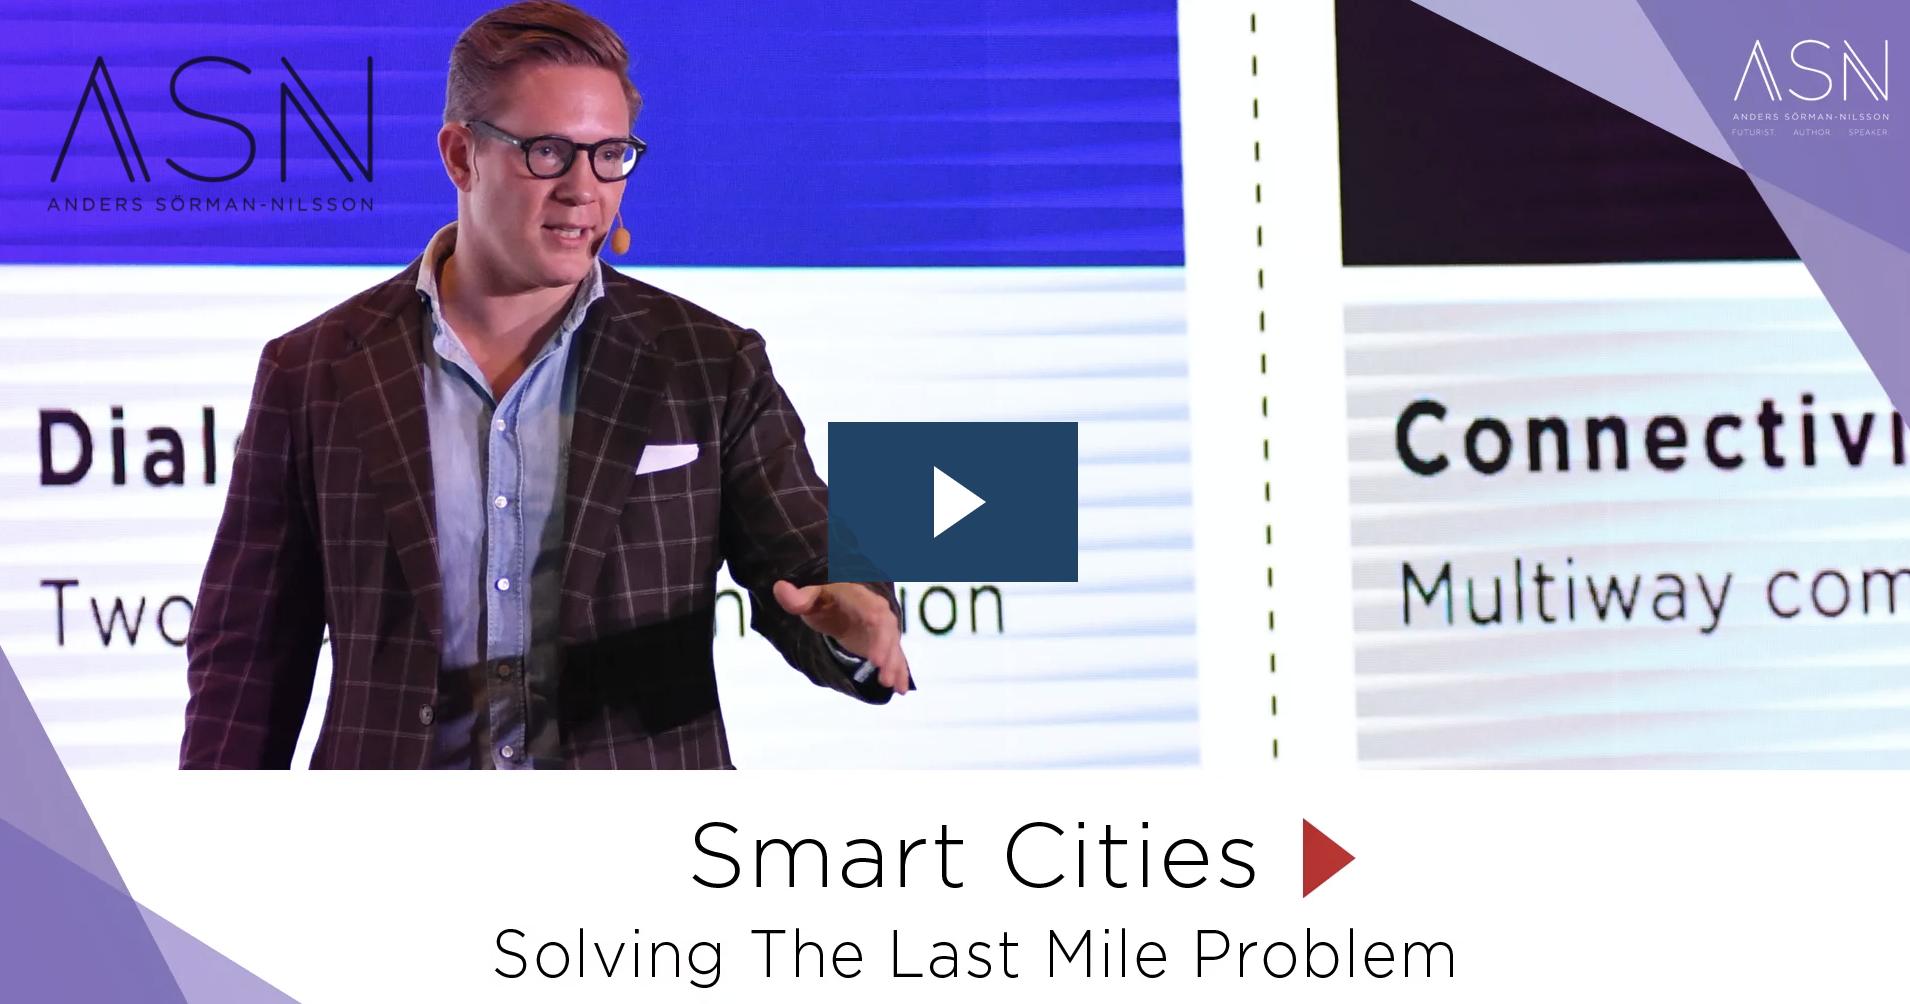 Smart Cities Futurist Anders Sorman-Nilsson